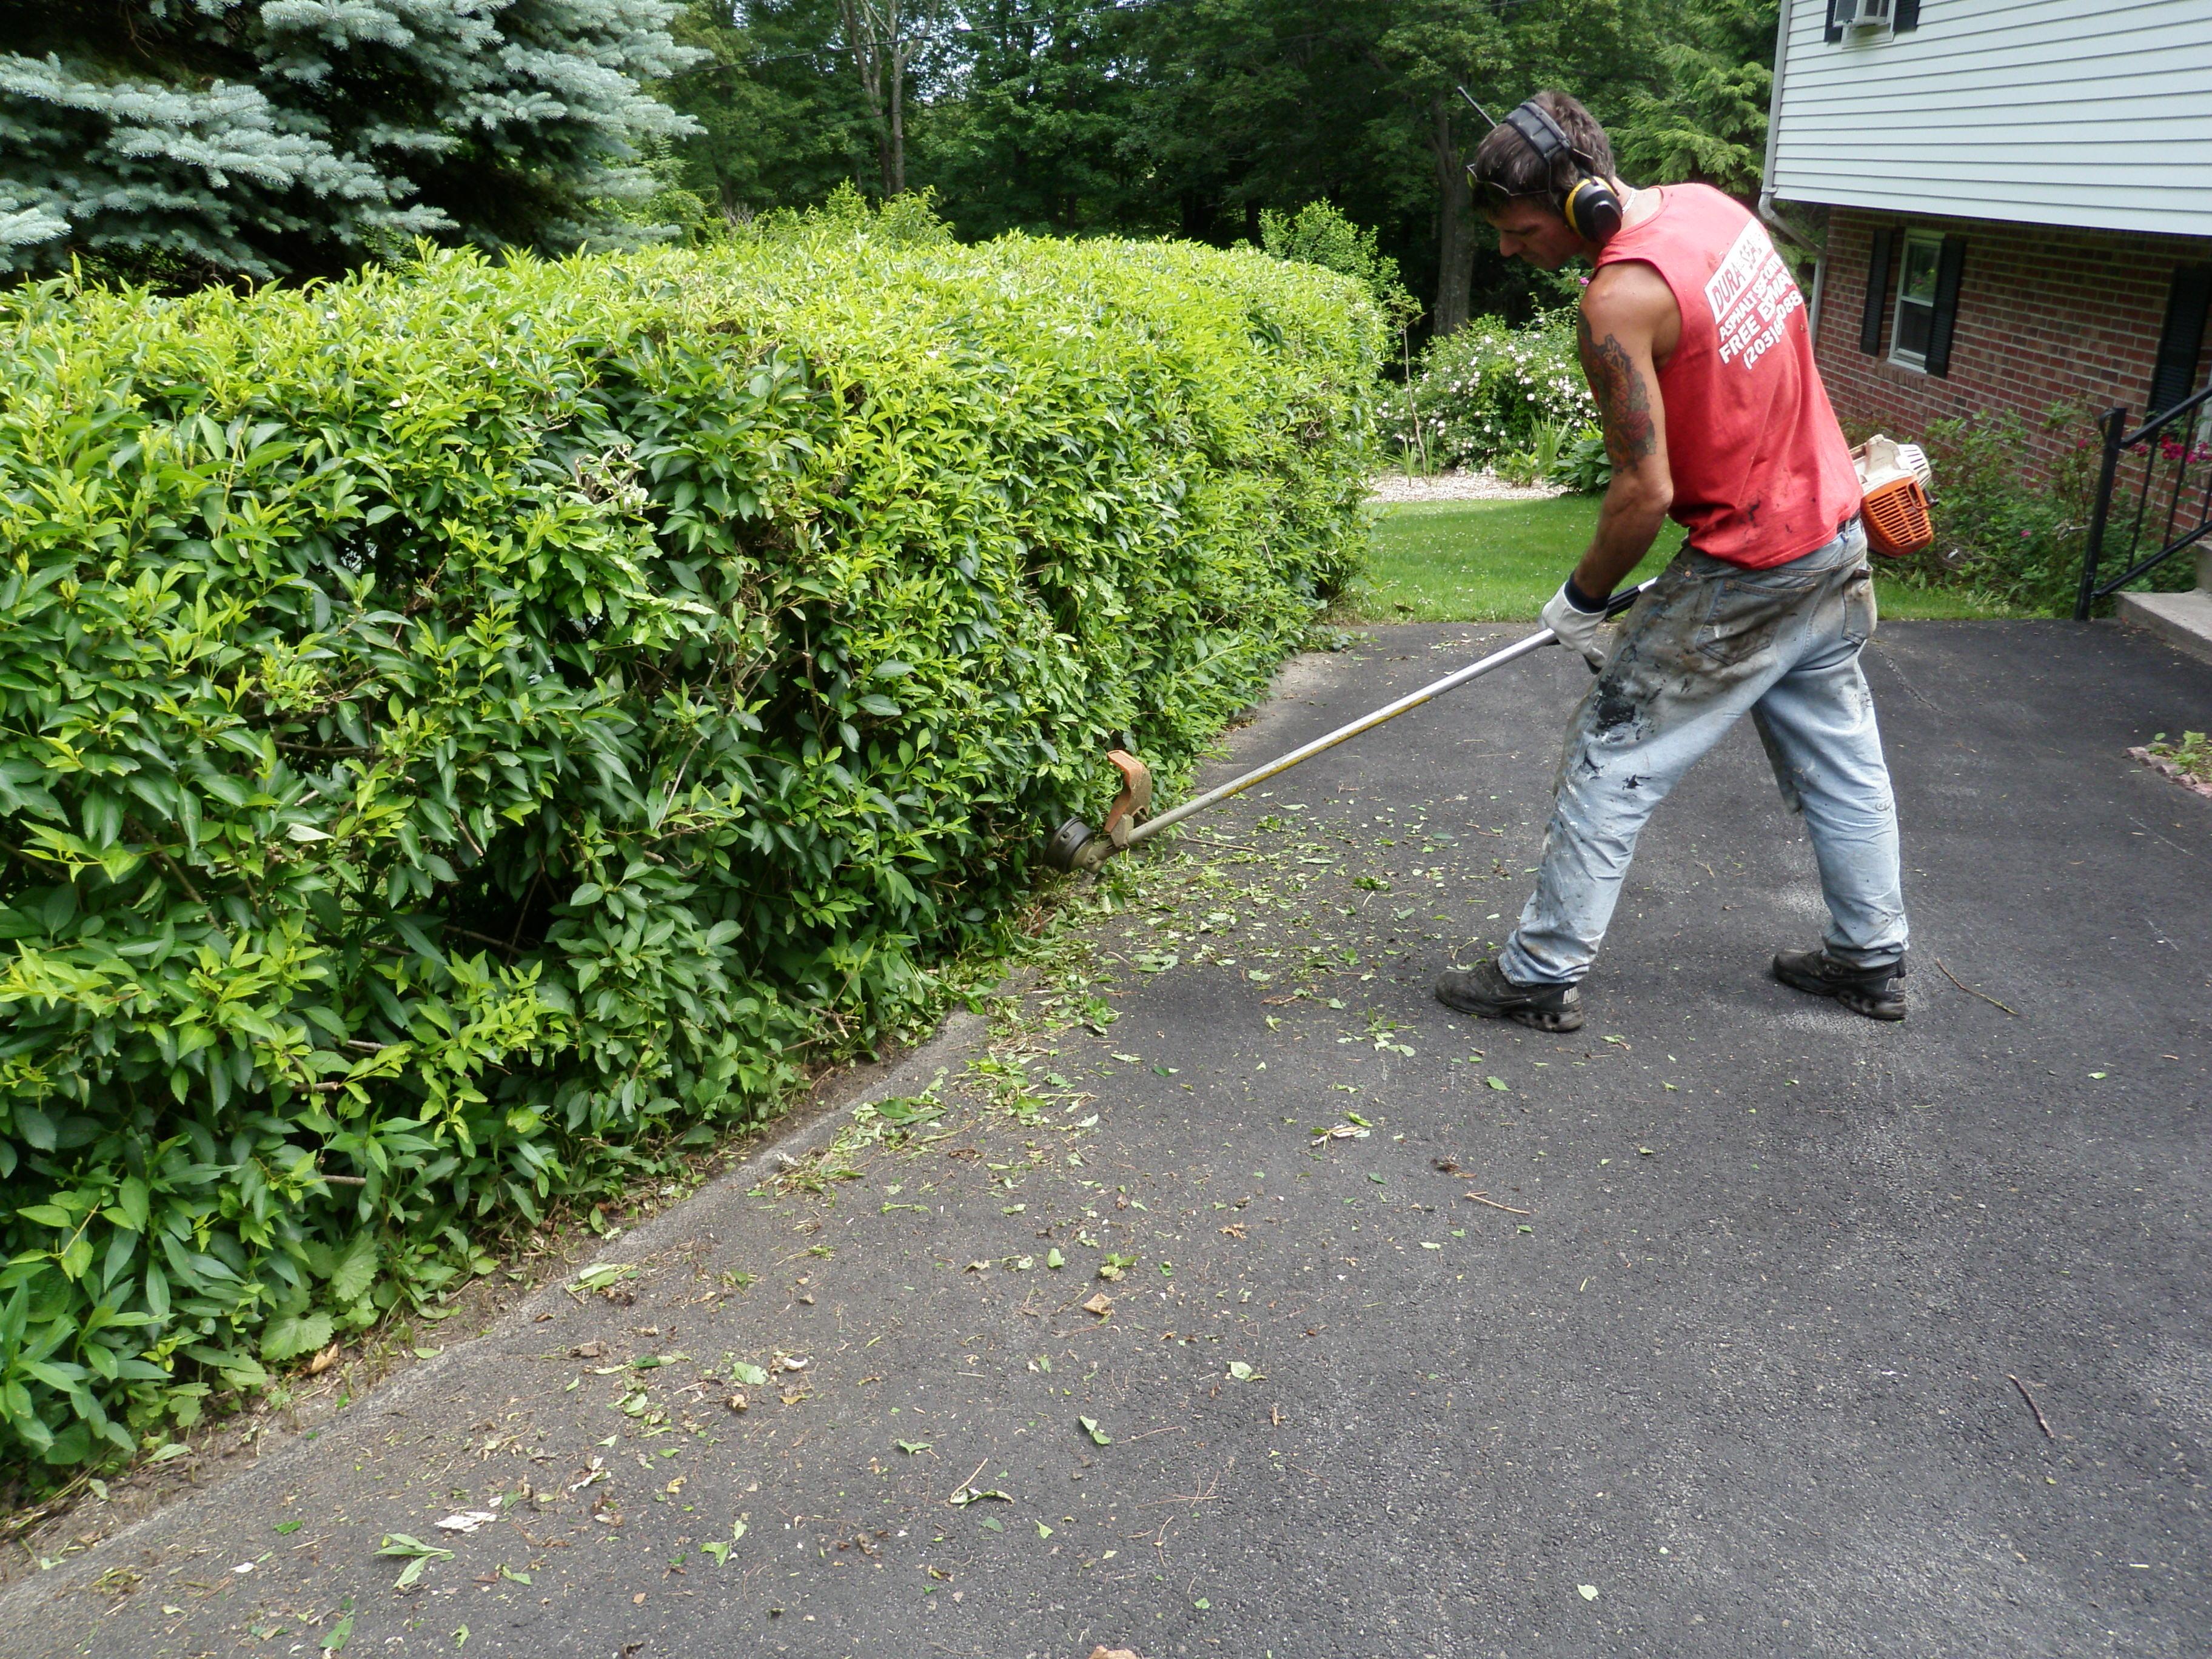 Trimming Bushes Before Sealing Driveway